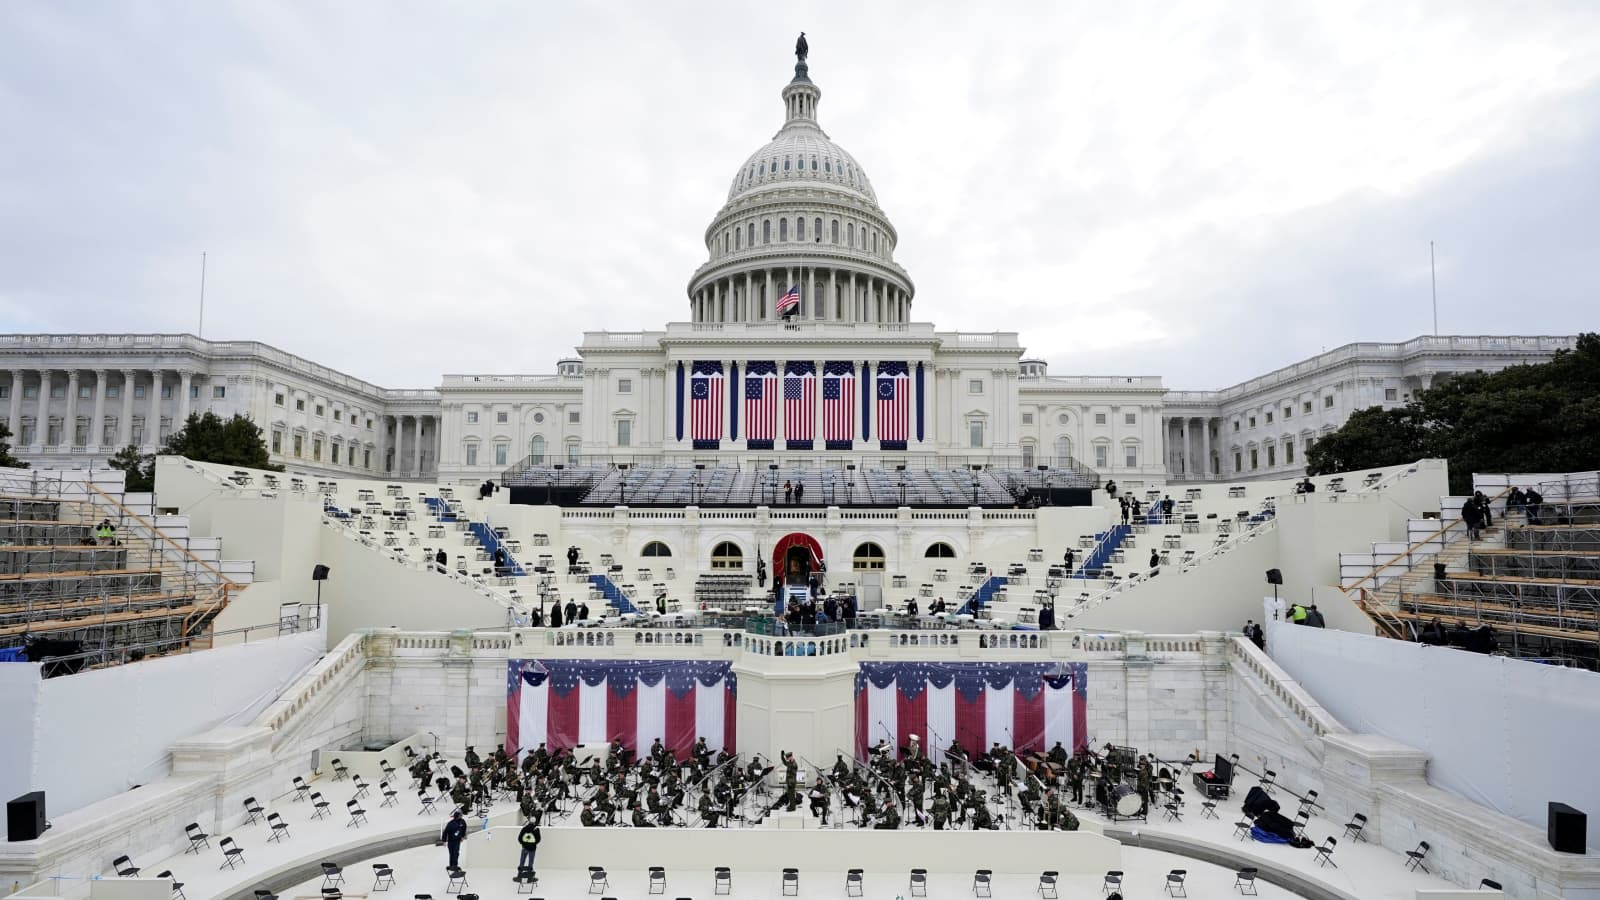 Joe Biden inauguration: Washington prepares for historic day